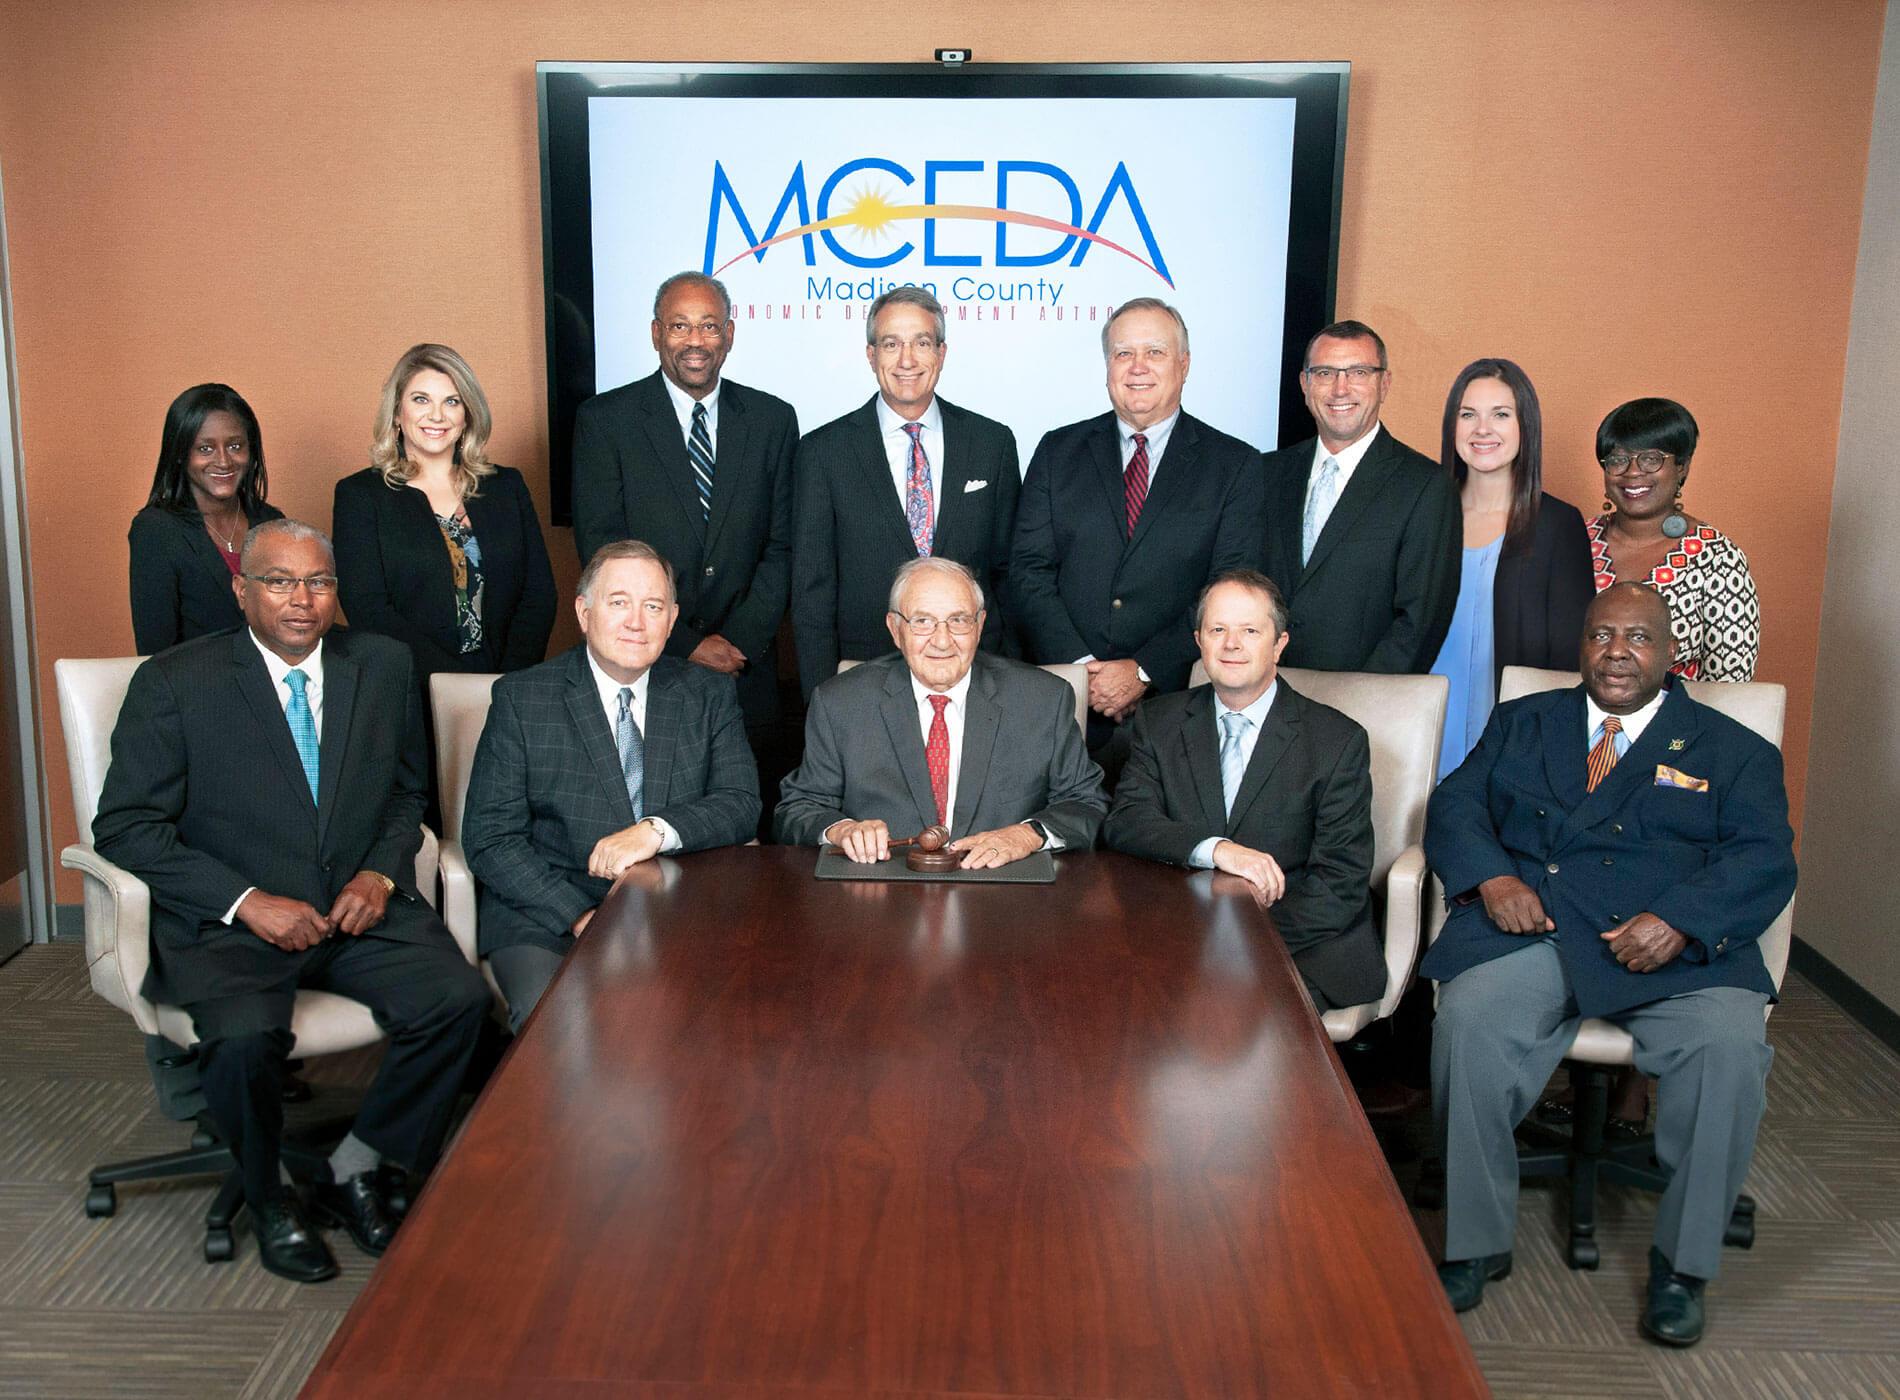 mceda-staff-new-2